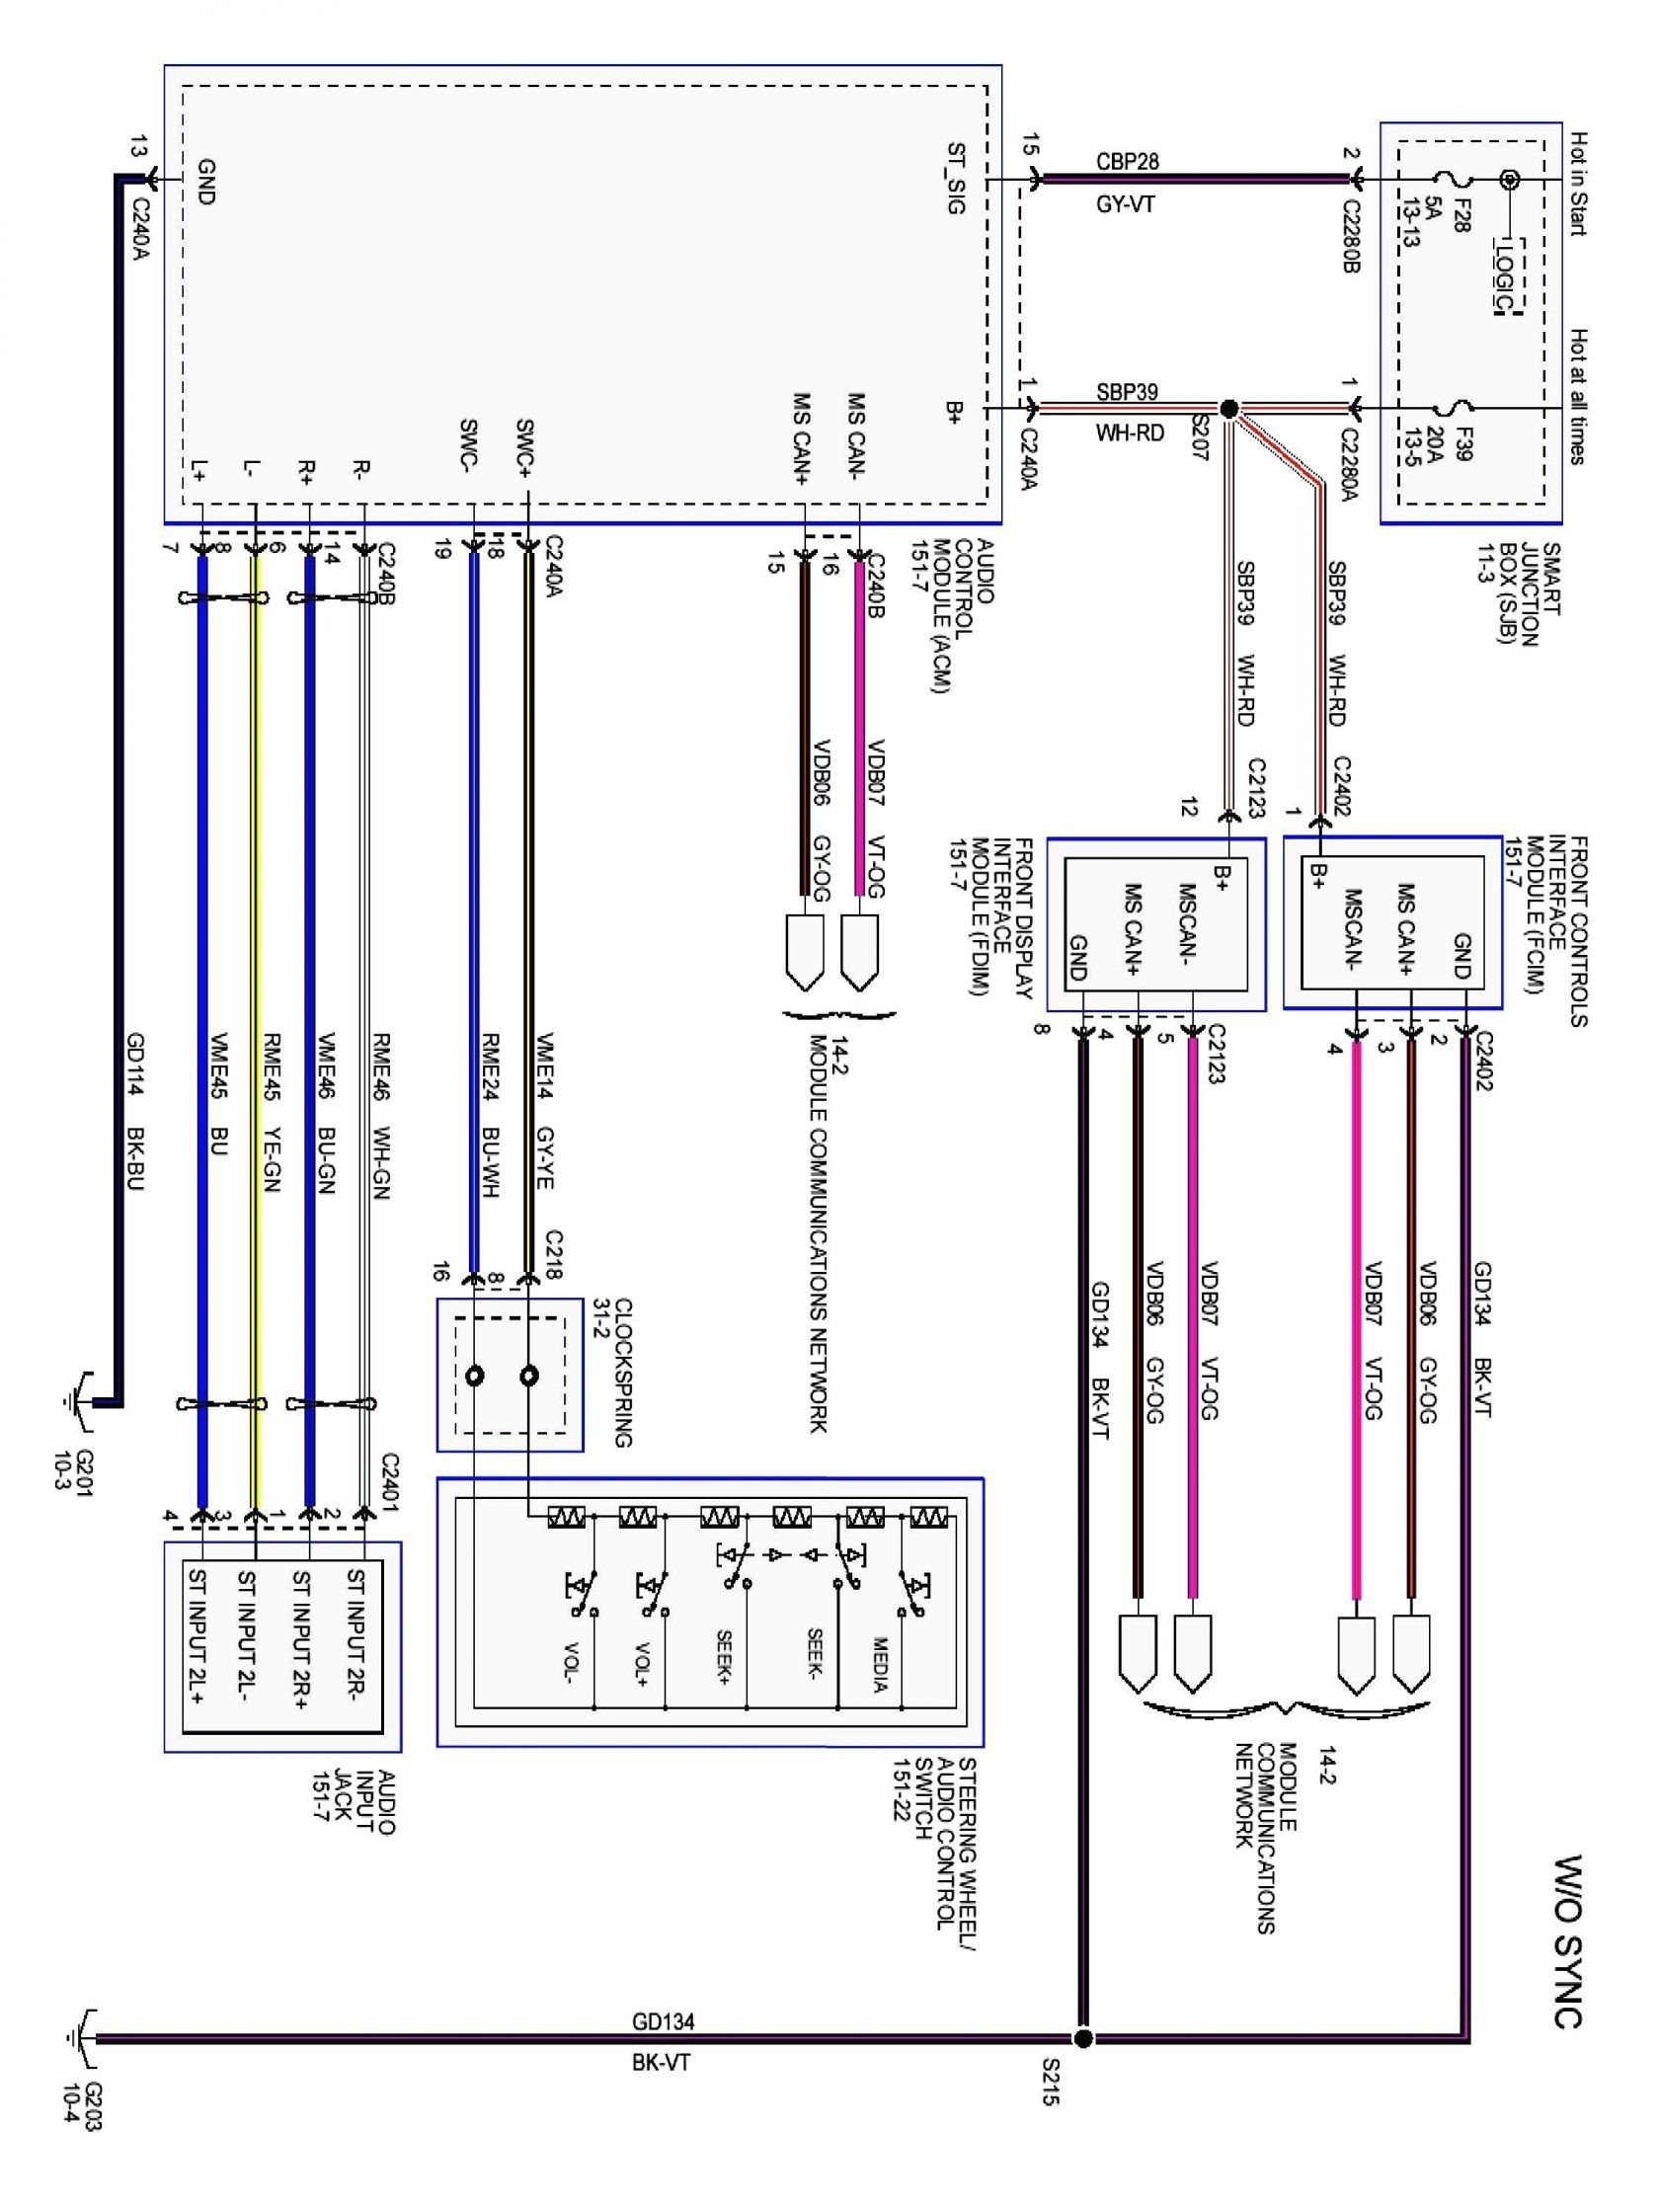 amp power step wiring diagram Download-Amp Research Power Step Wiring Diagram Valid Wiring Diagram For Rv Steps New Amp Power Step Wiring Diagram Gidn 9-p